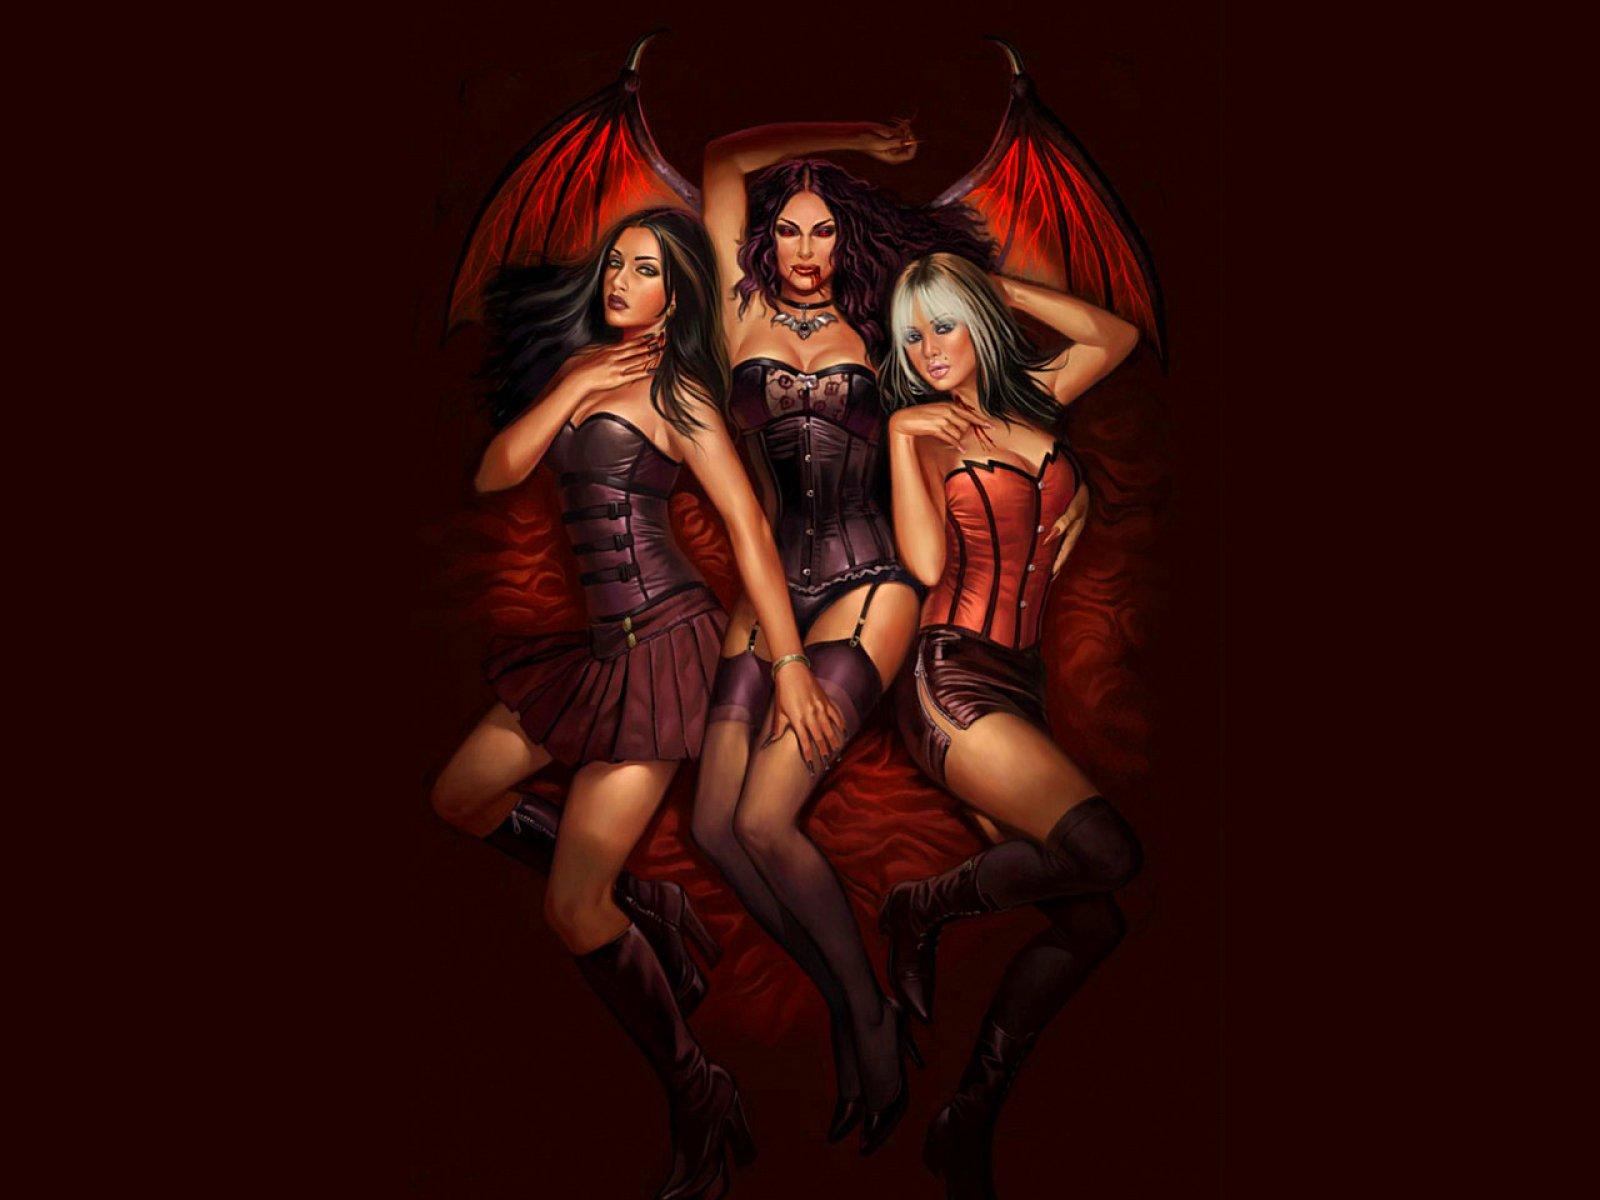 Seksy vampire wallpaper hentai bizarre whore